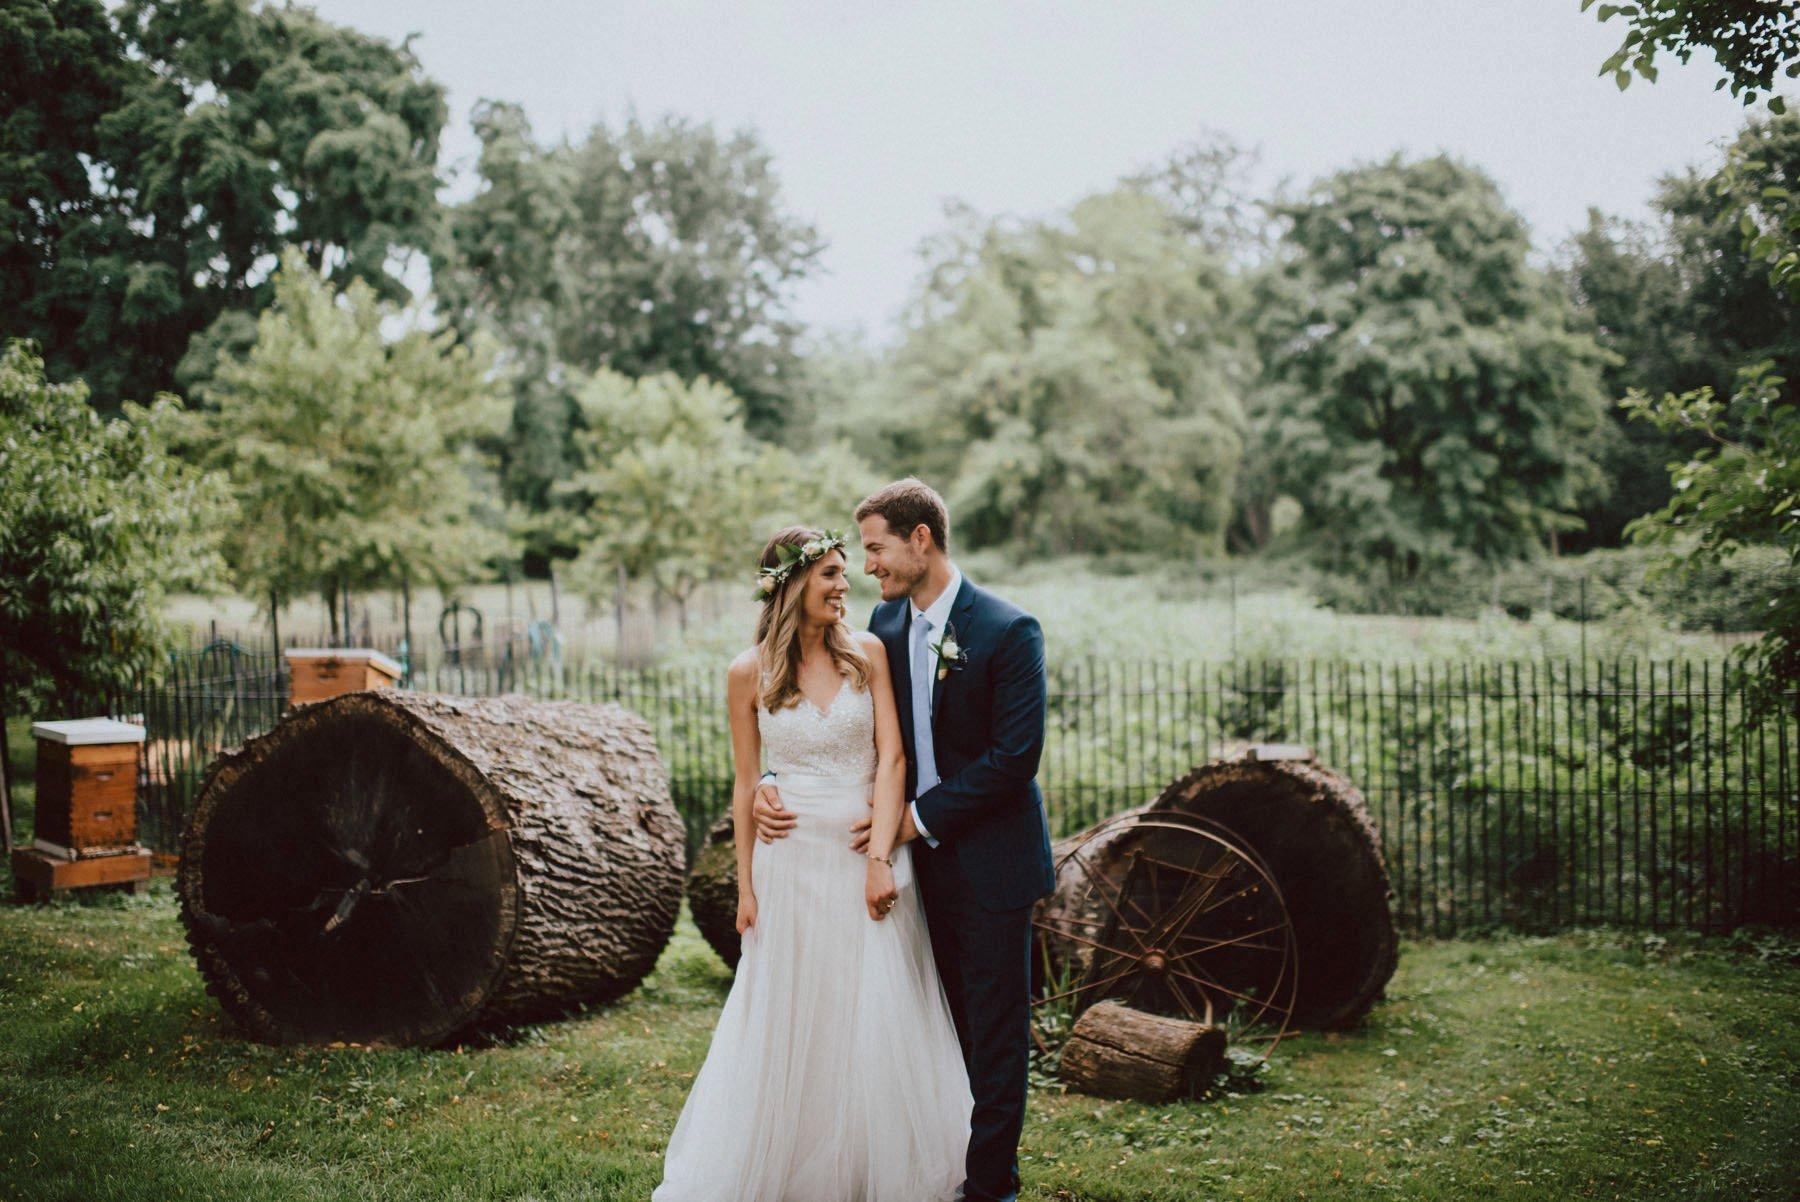 Knowlton-mansion-wedding-78.jpg